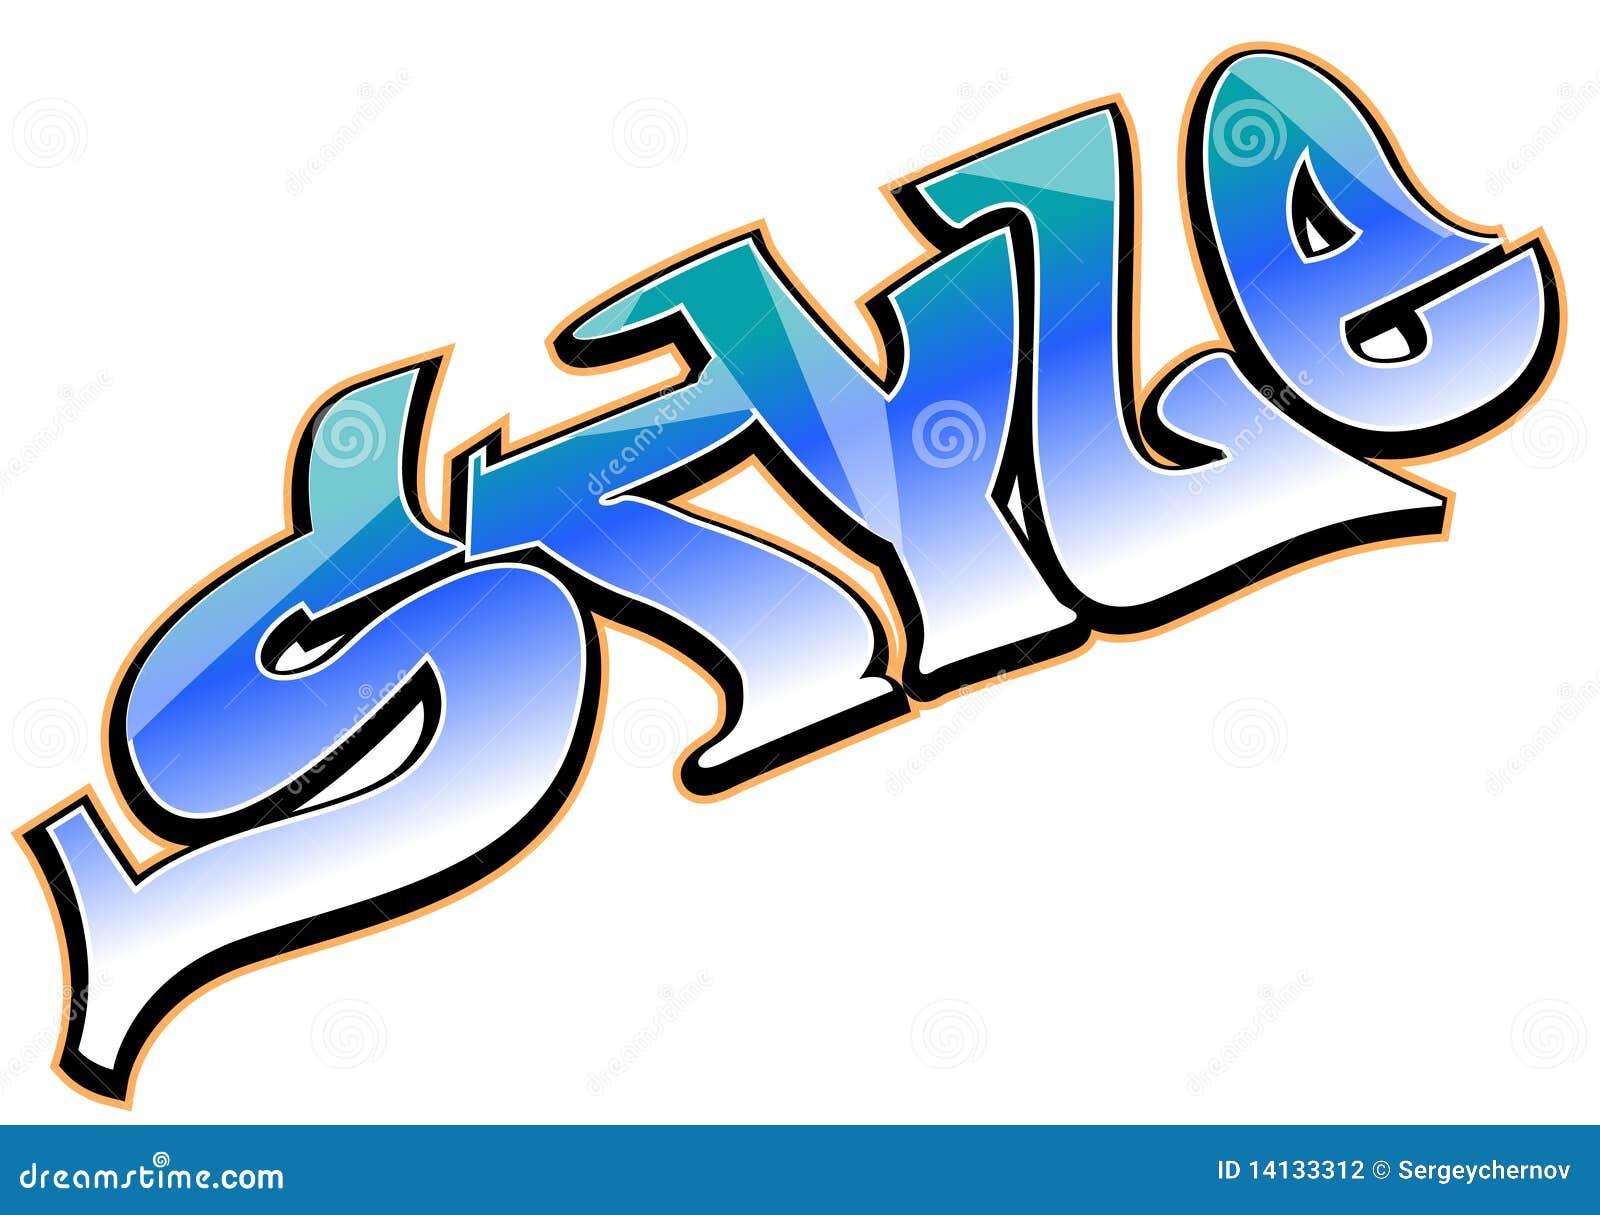 Graffiti art designs - Graffiti Art Design Style Stock Photography